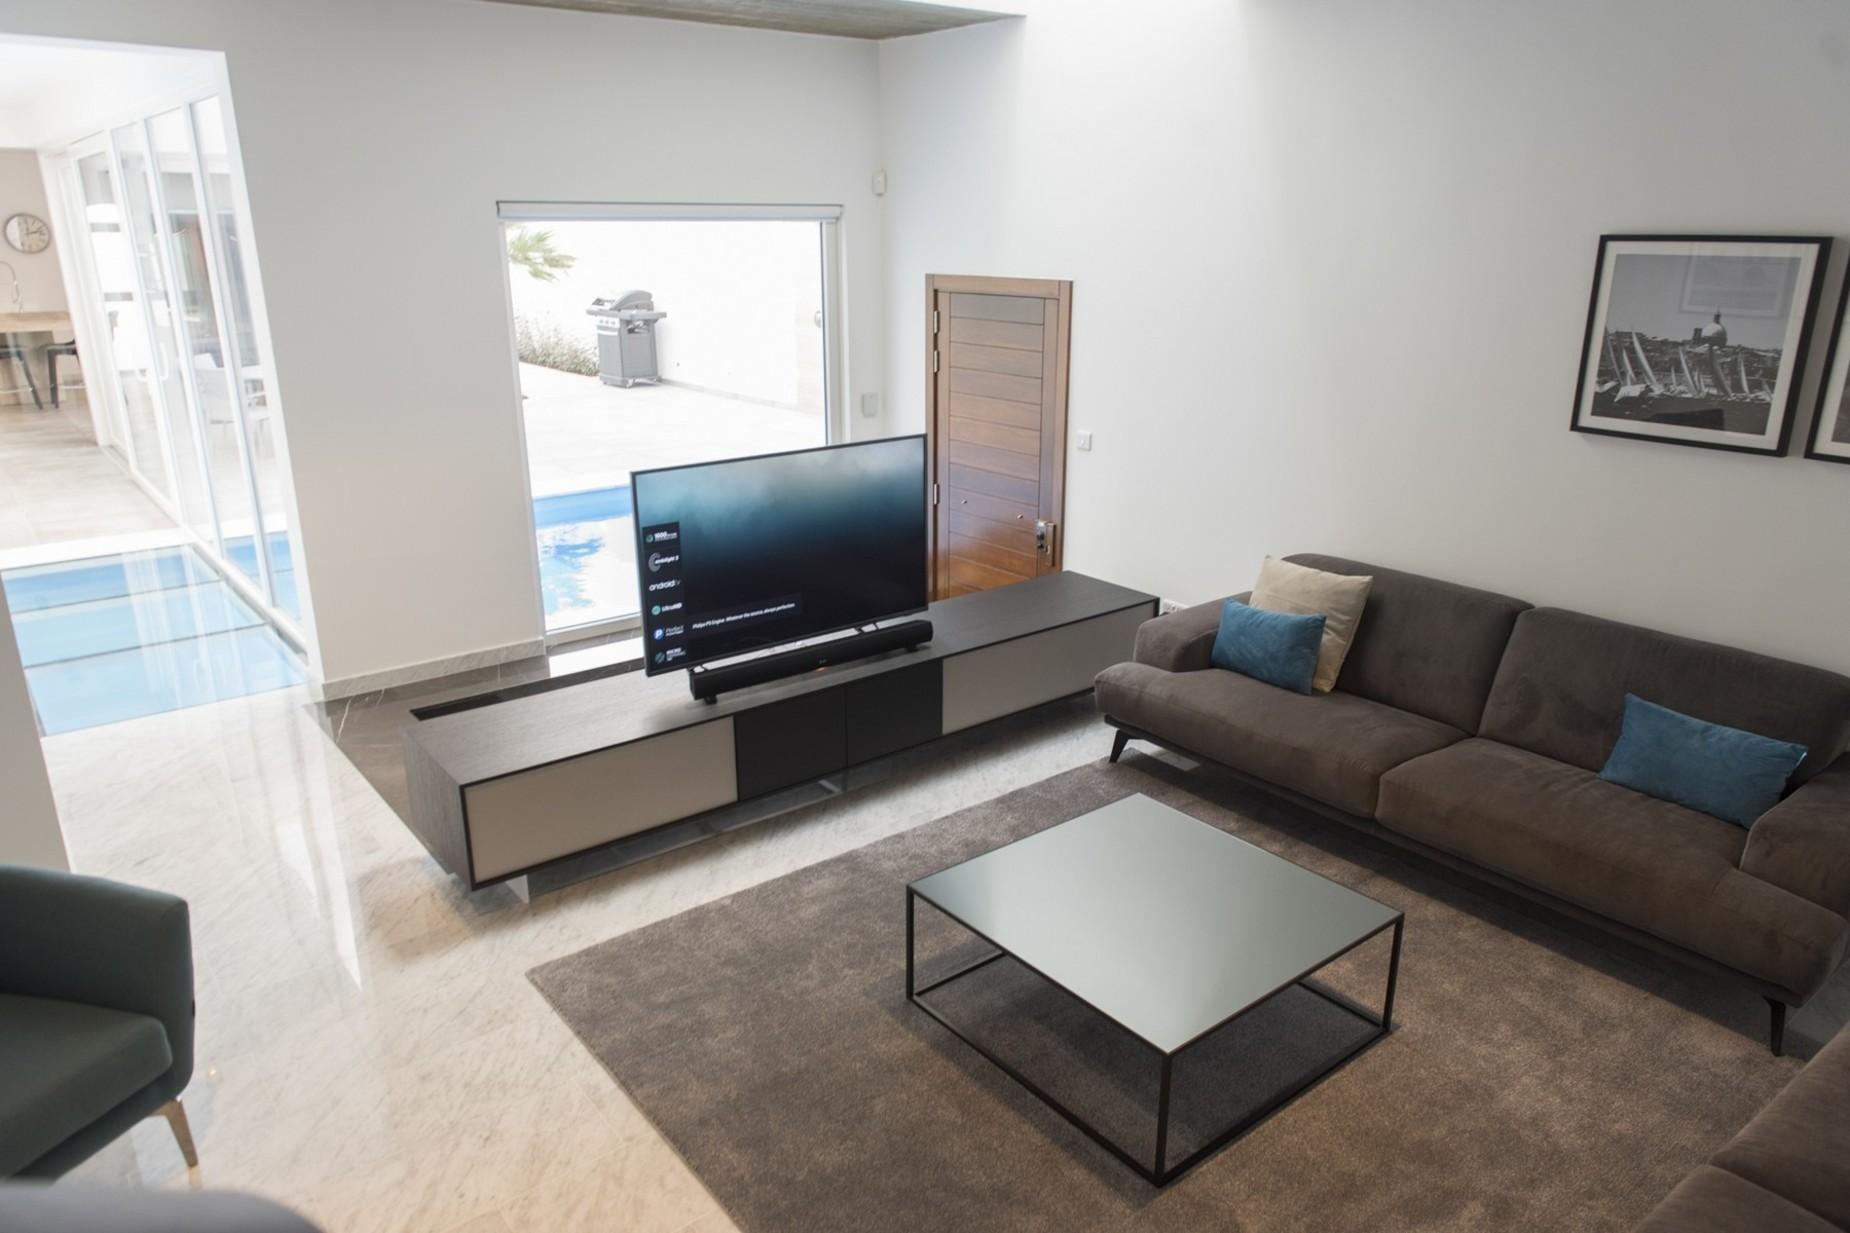 3 bed Villa For Rent in Ibragg, Ibragg - thumb 3